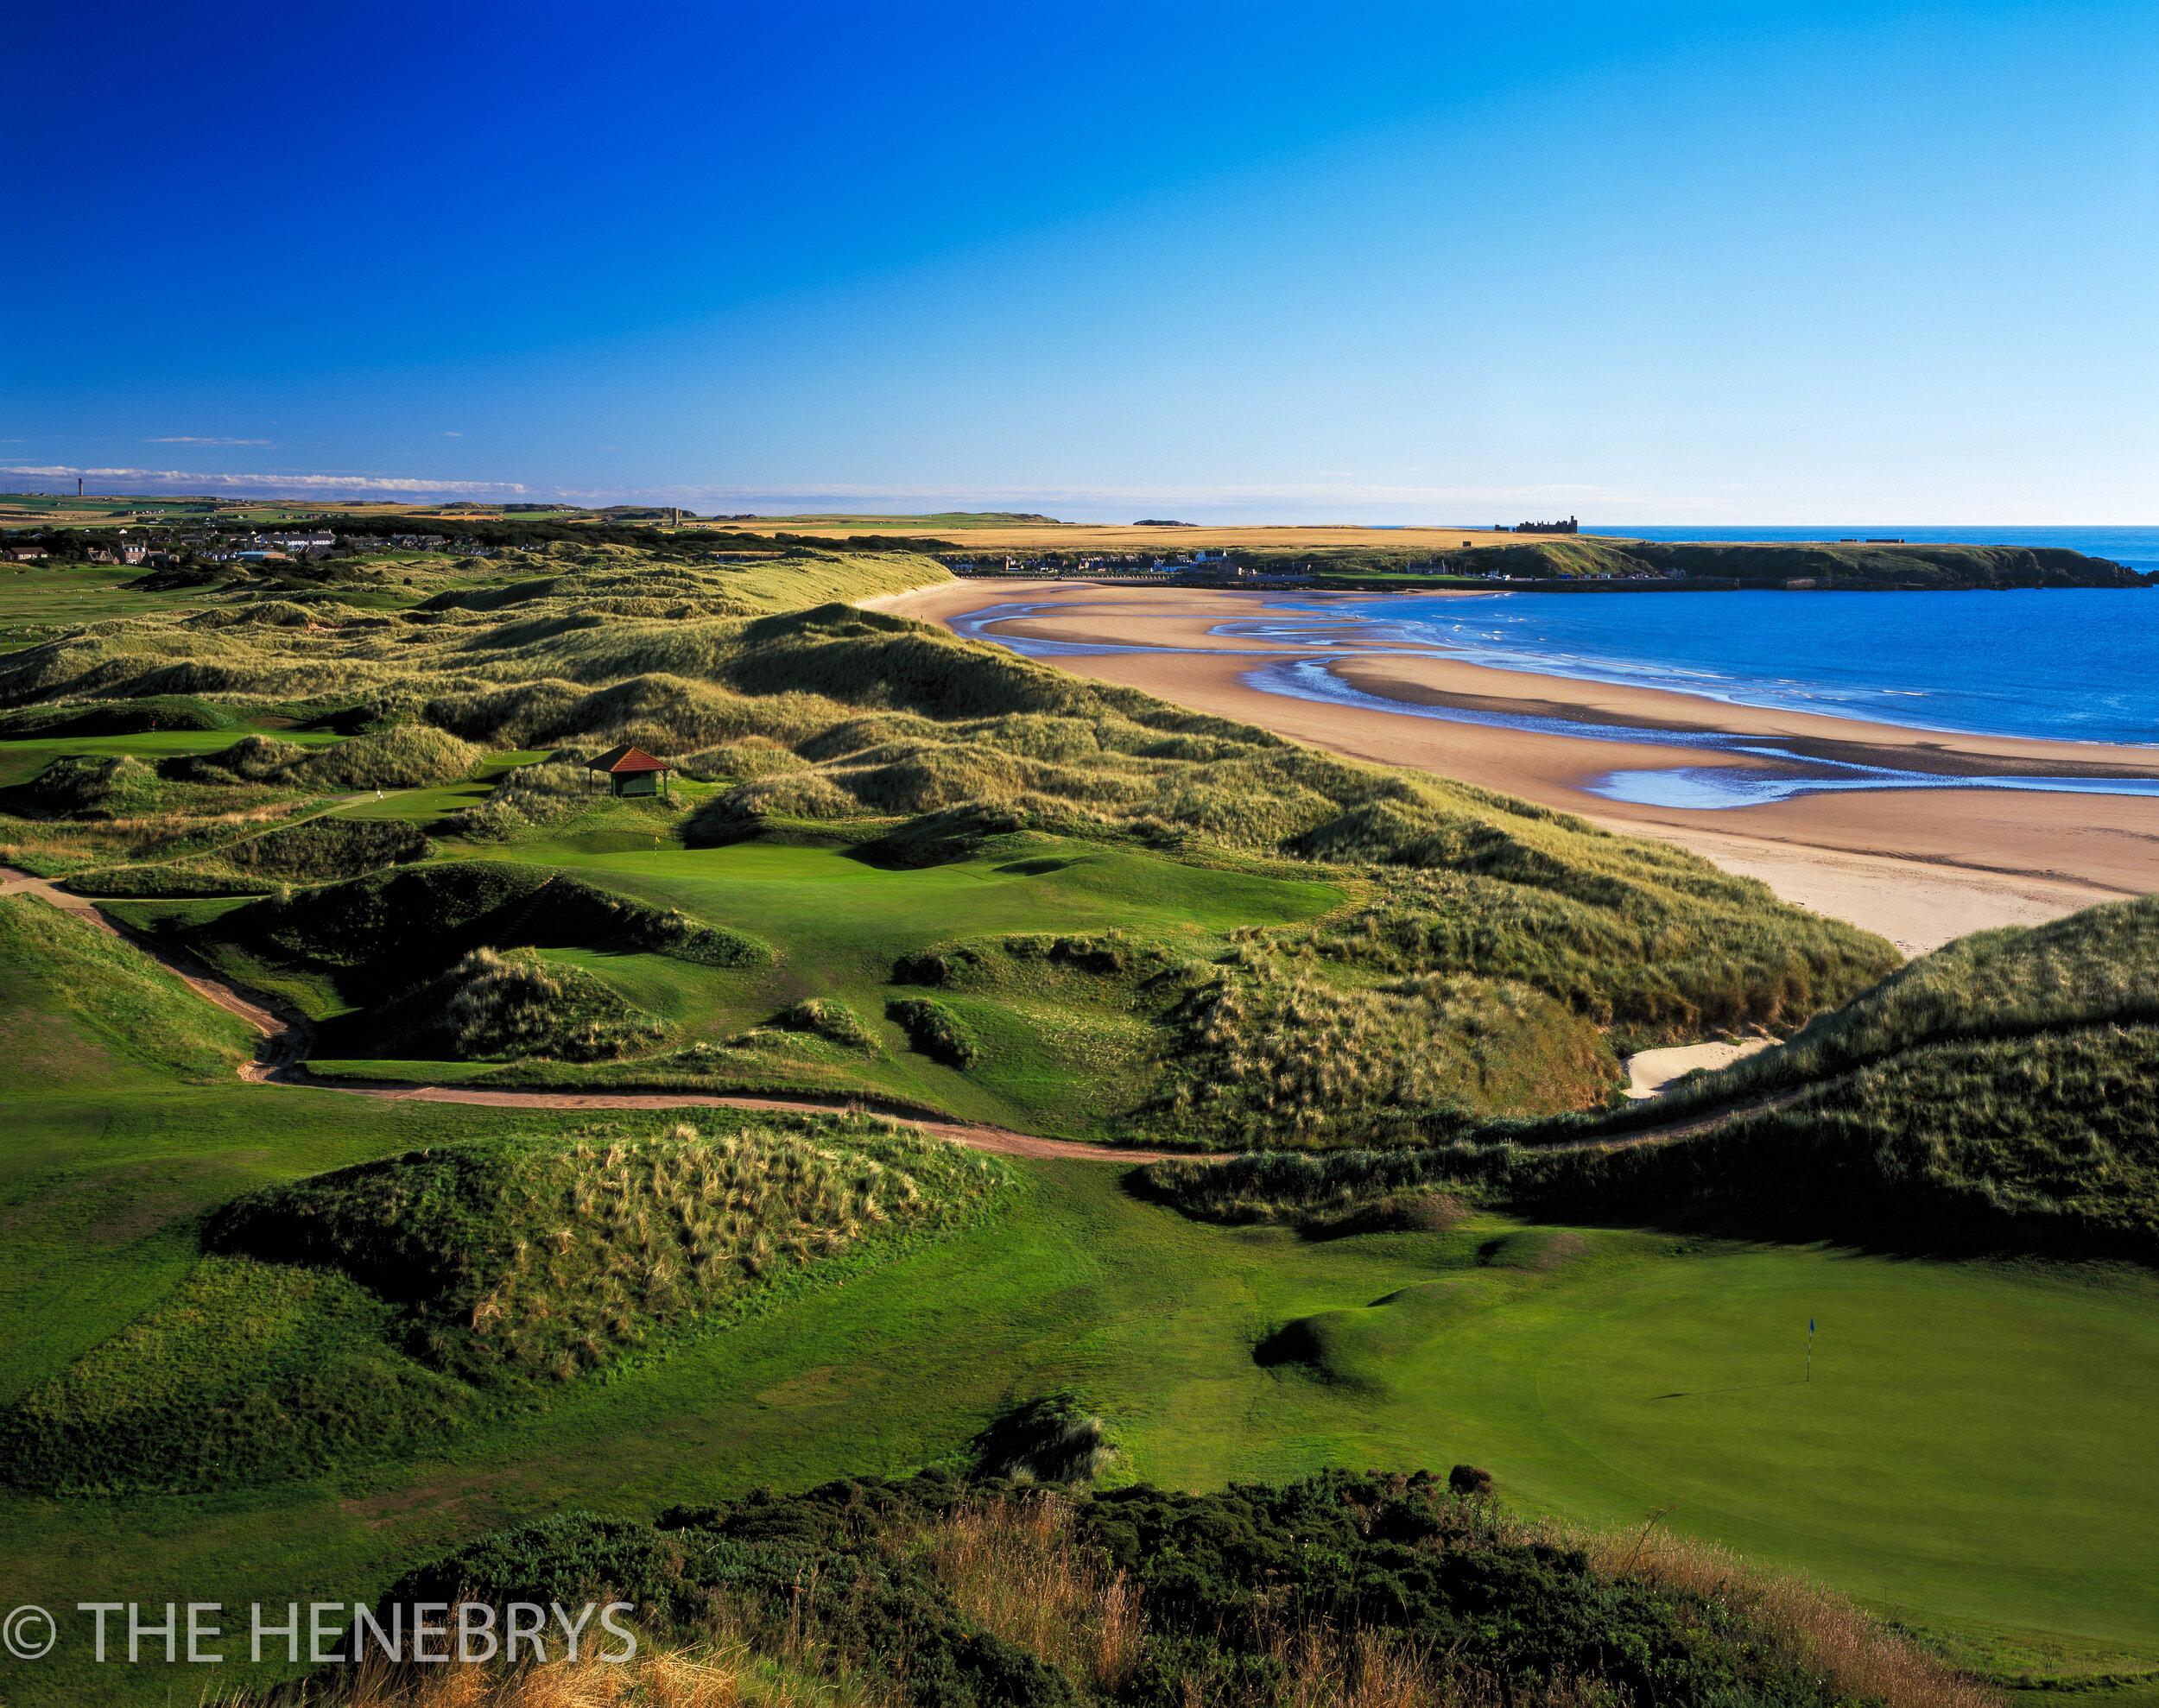 Cruden Bay Golf Club #09, Cruden Bay, Scotland